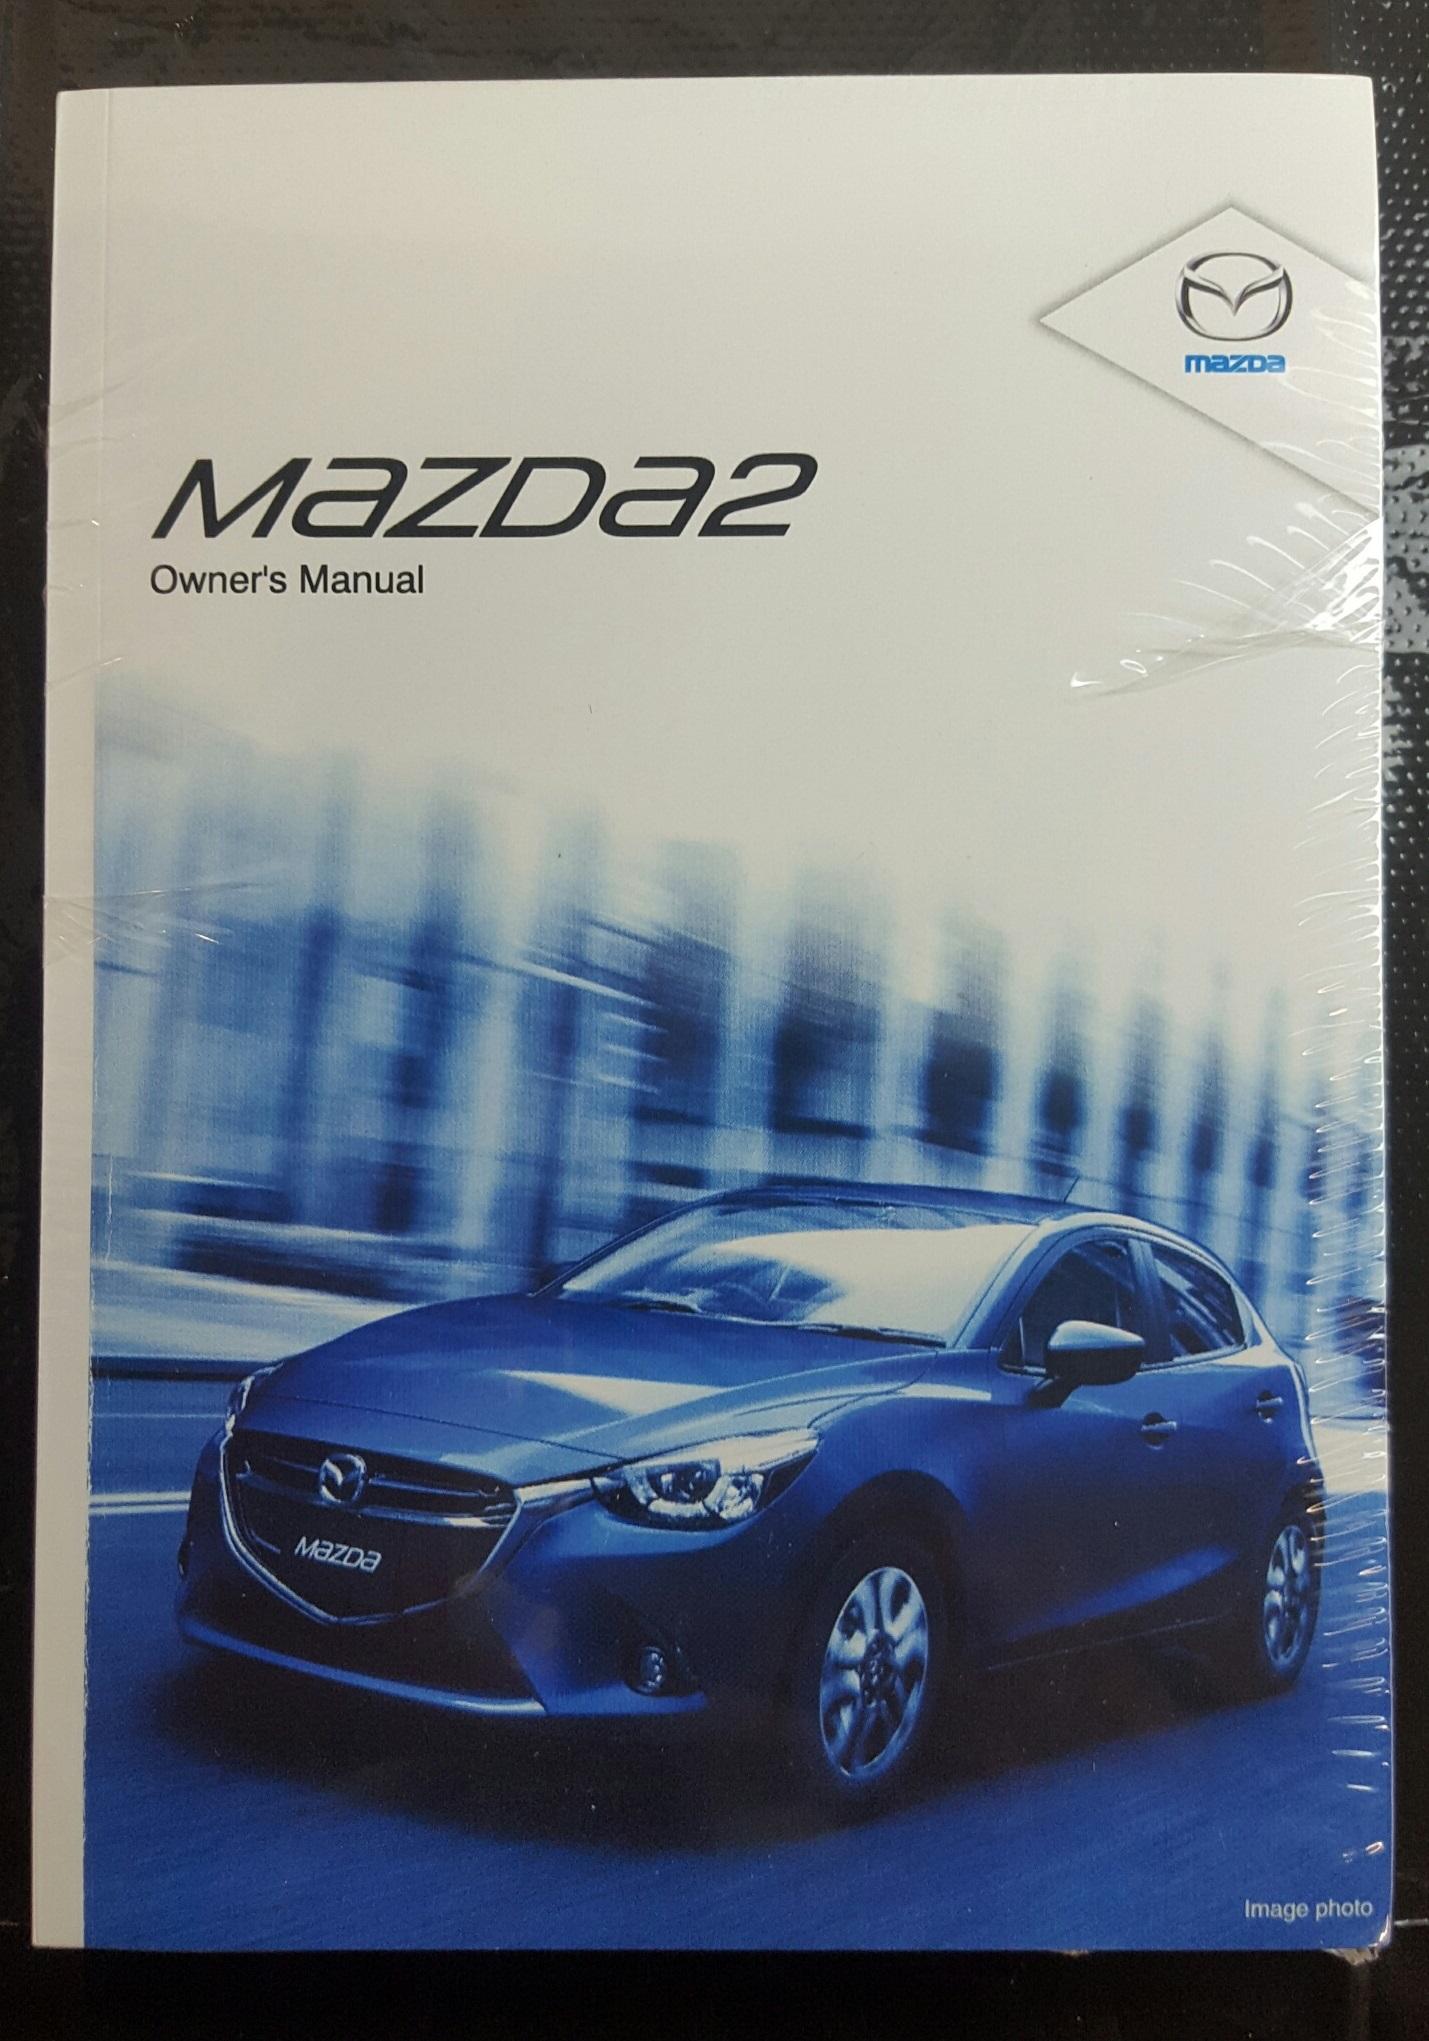 new genuine mazda 2 dj owners manual 8ec4 eo 14ht mazda2 2014 2016 rh ebay com au Mazda SUV Mazda SUV